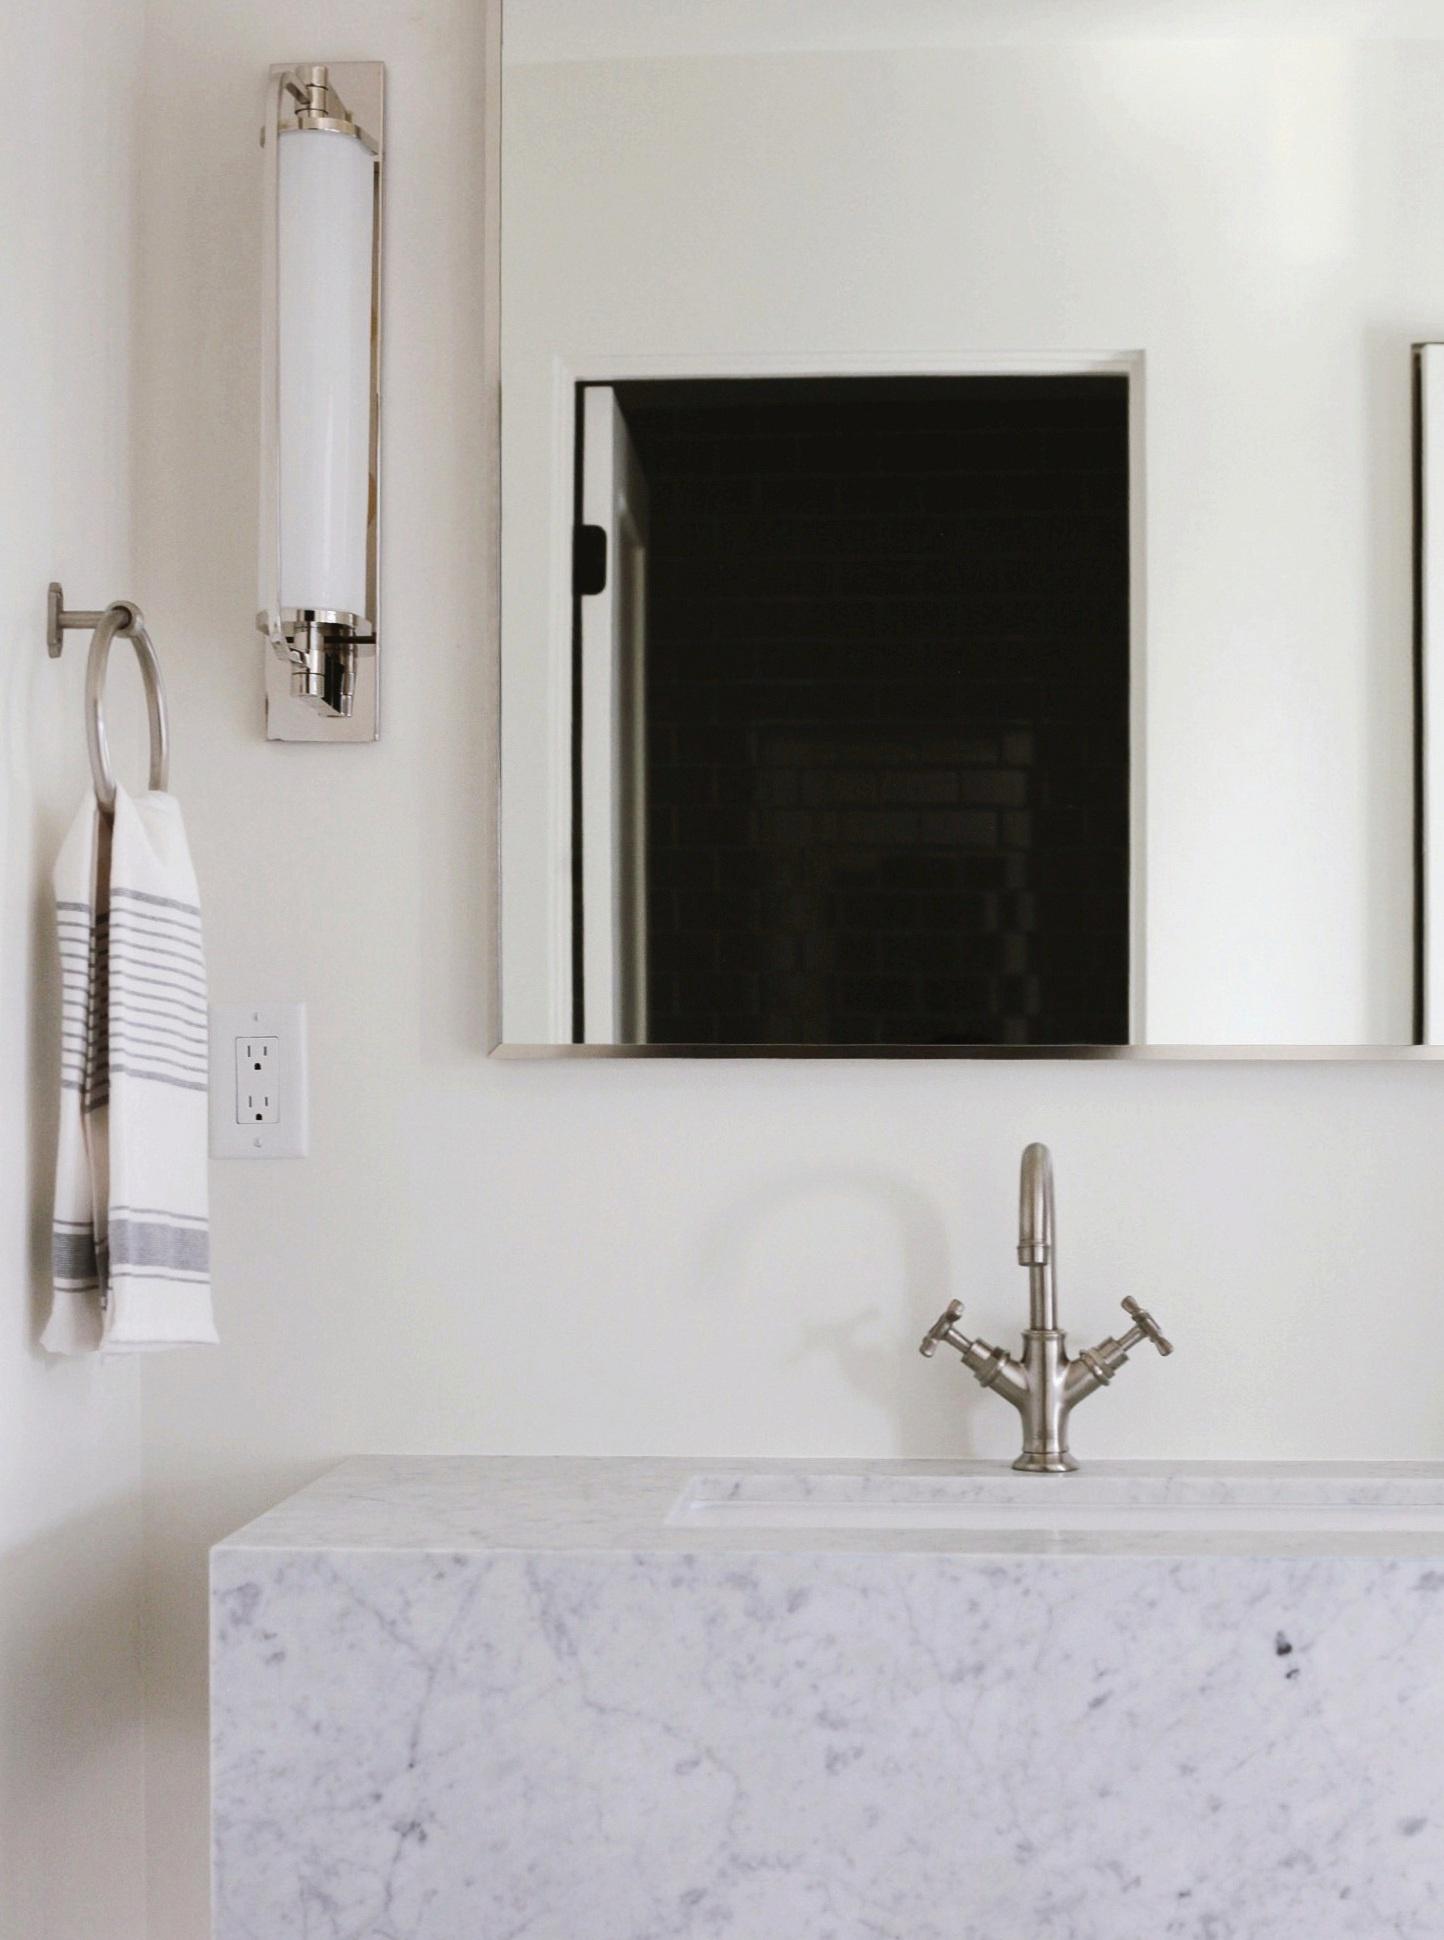 Bathroom Country Club 2 Details